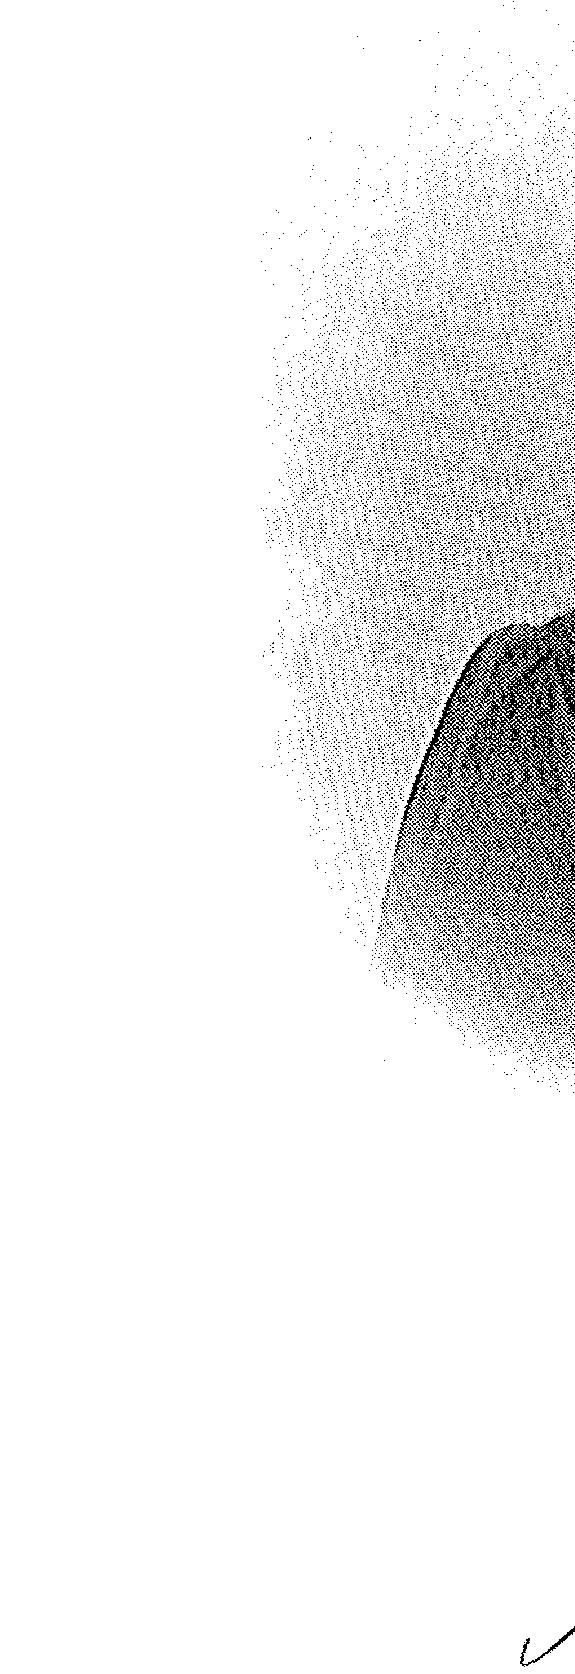 [ocr errors][ocr errors][ocr errors][graphic][graphic][graphic][graphic]